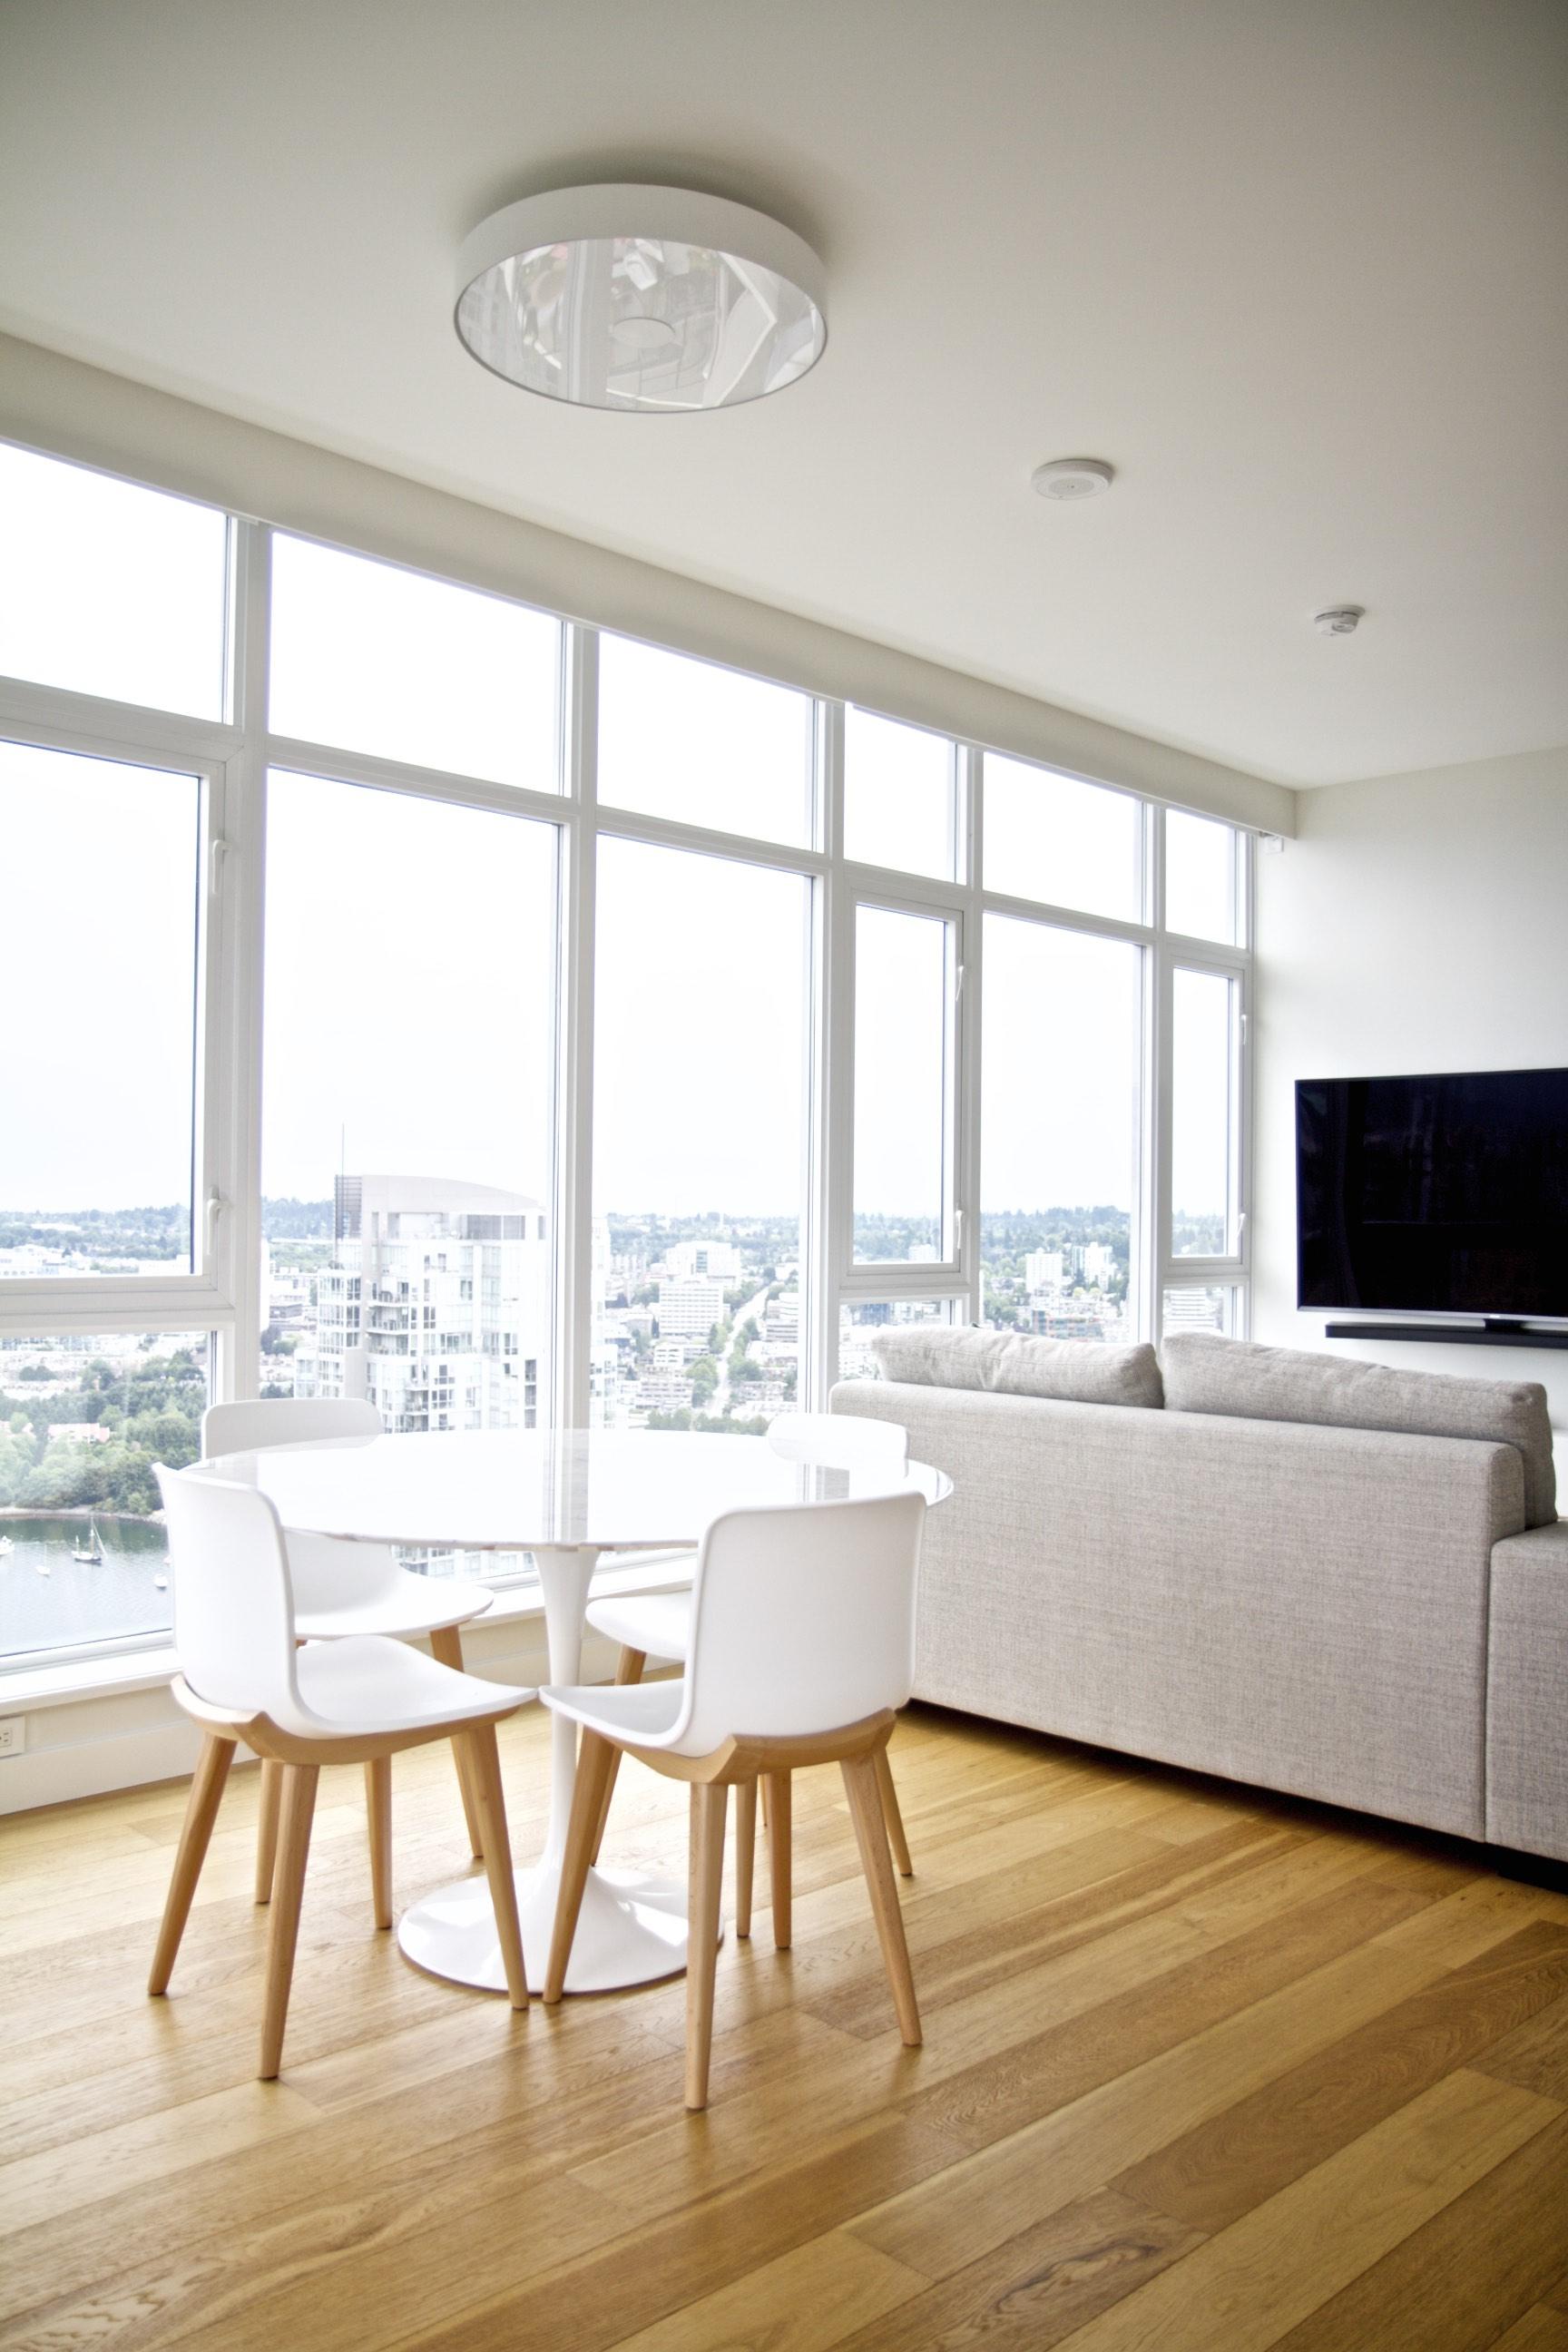 interior-design-mocoro-studio-yaletown-condo-beautiful-warm-living-cozy-city-dwell-curated-bespoke_2682.jpg